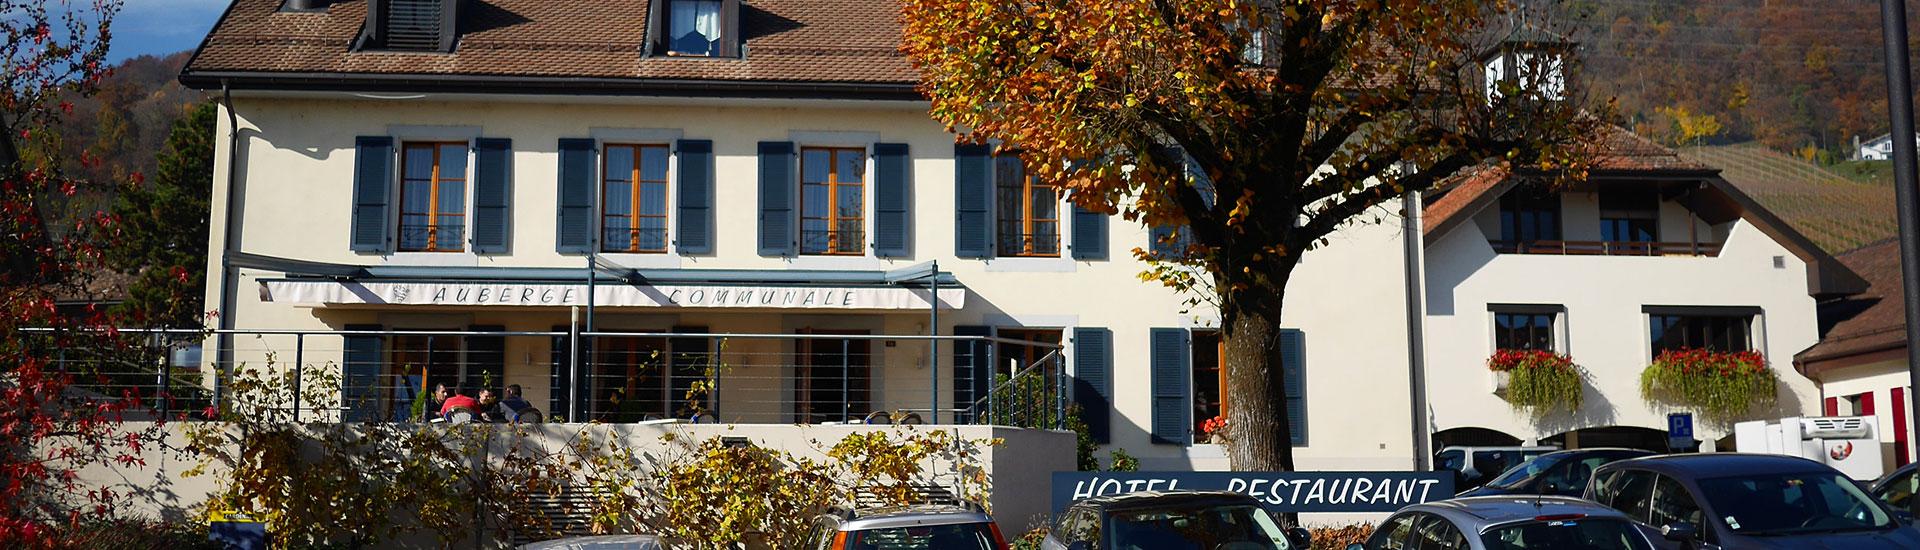 Hôtel Restaurant Auberge de Gilly